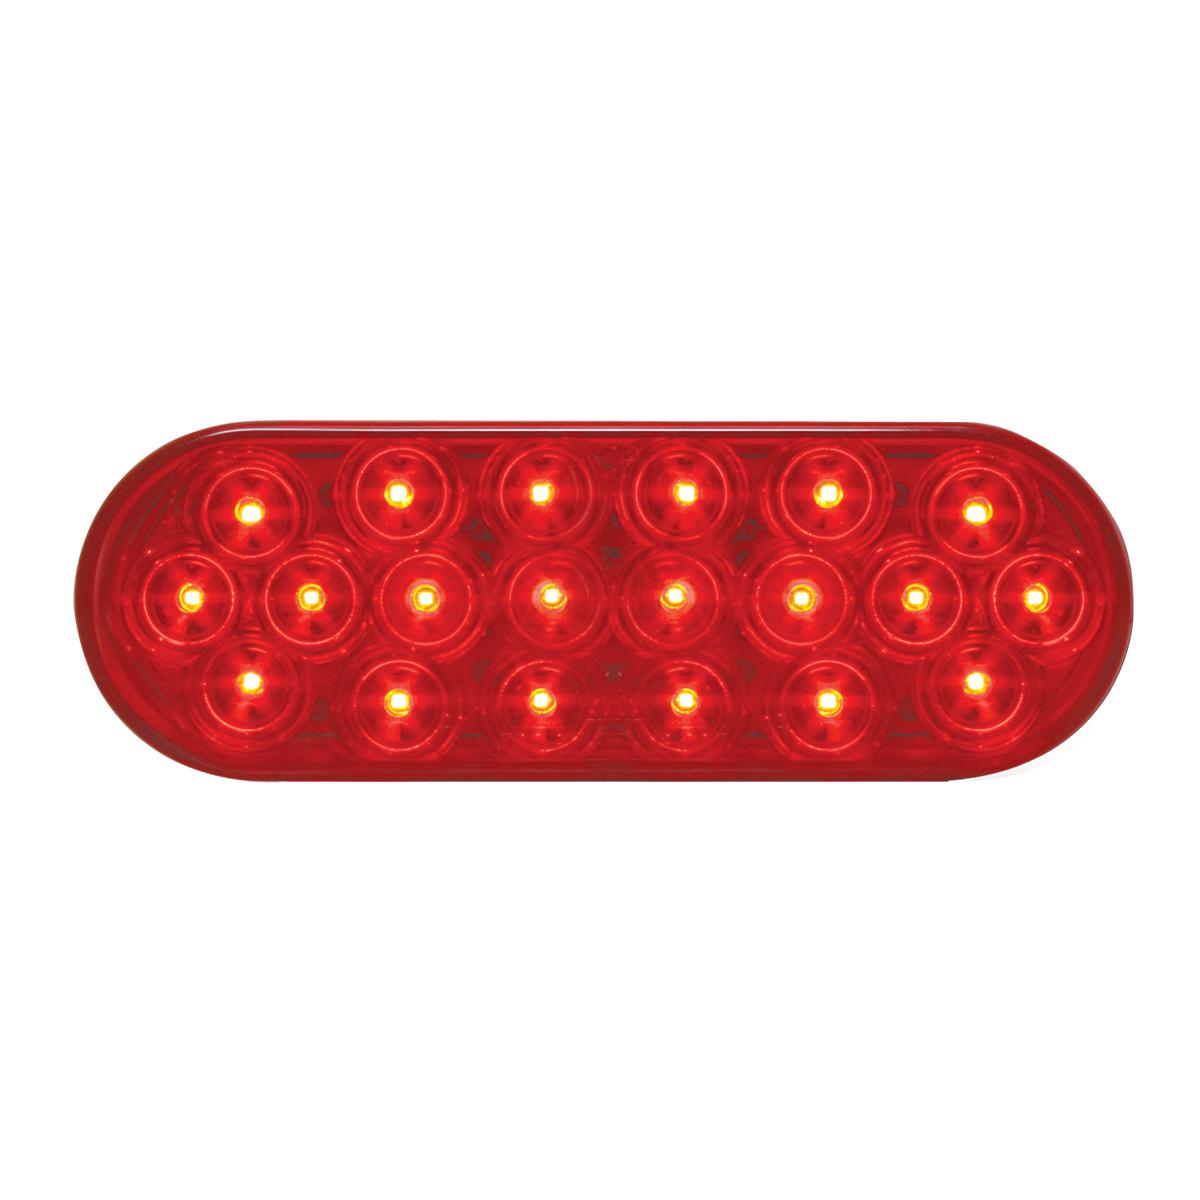 #87721 Oval Fleet LED Flat Red/Red Light